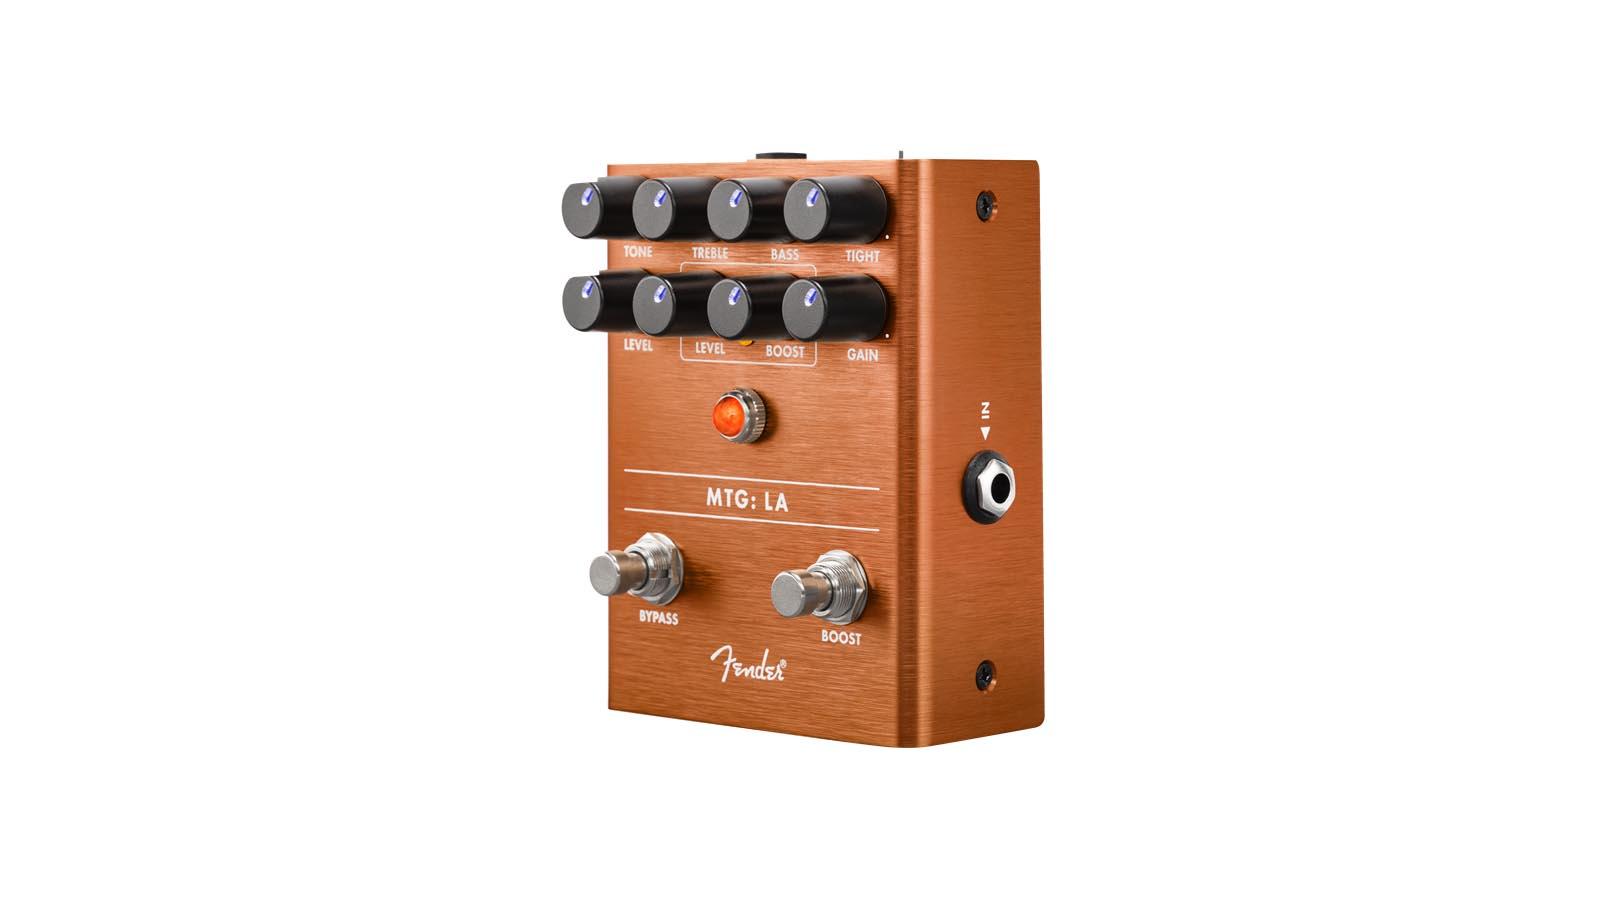 Fender MTG:LA Tube Overdrive/Distortion